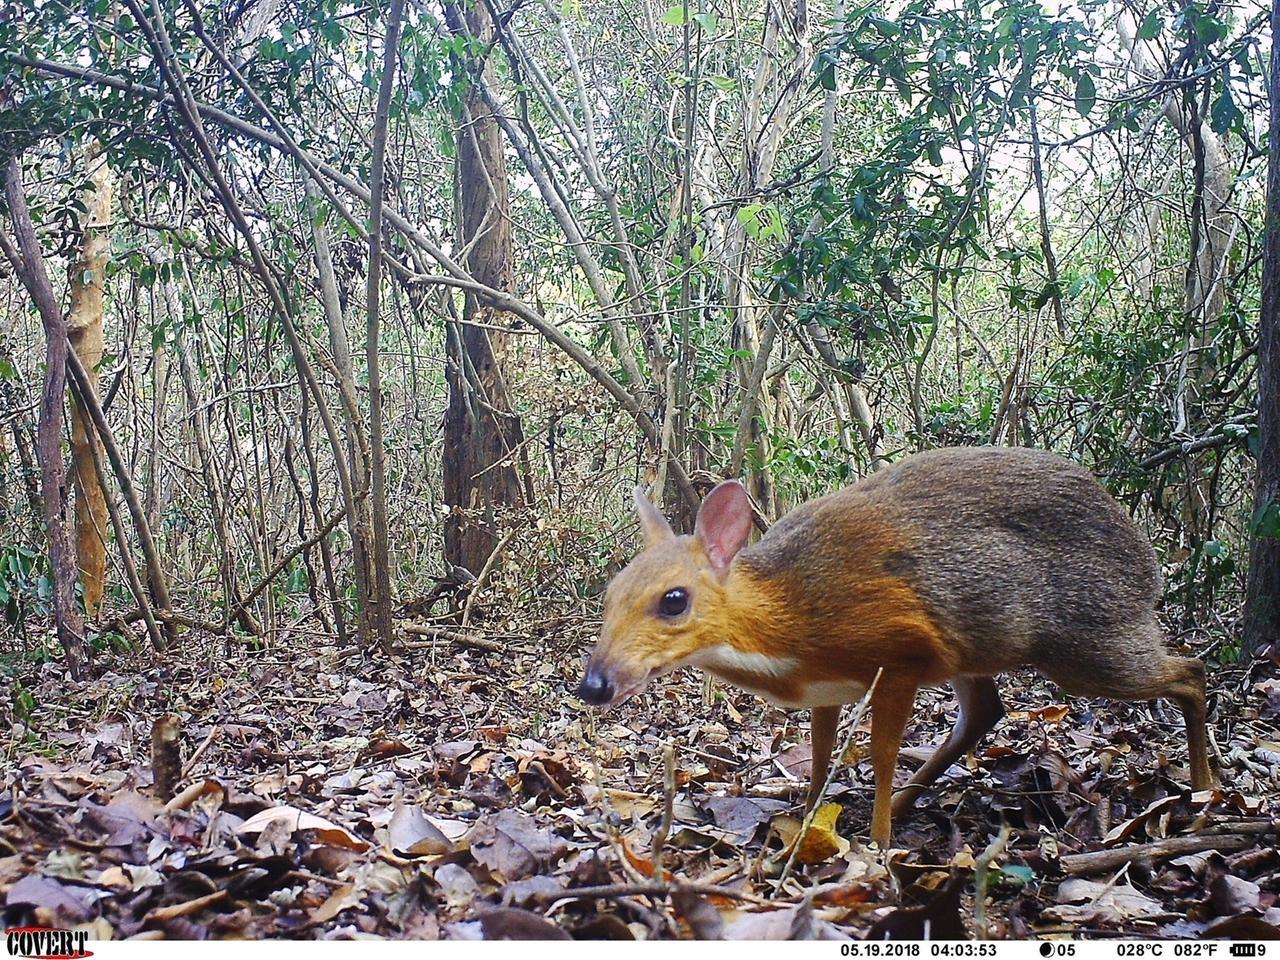 Jahrzehntelang verschwunden: Hirschferkel-Art in Vietnam wiederentdeckt